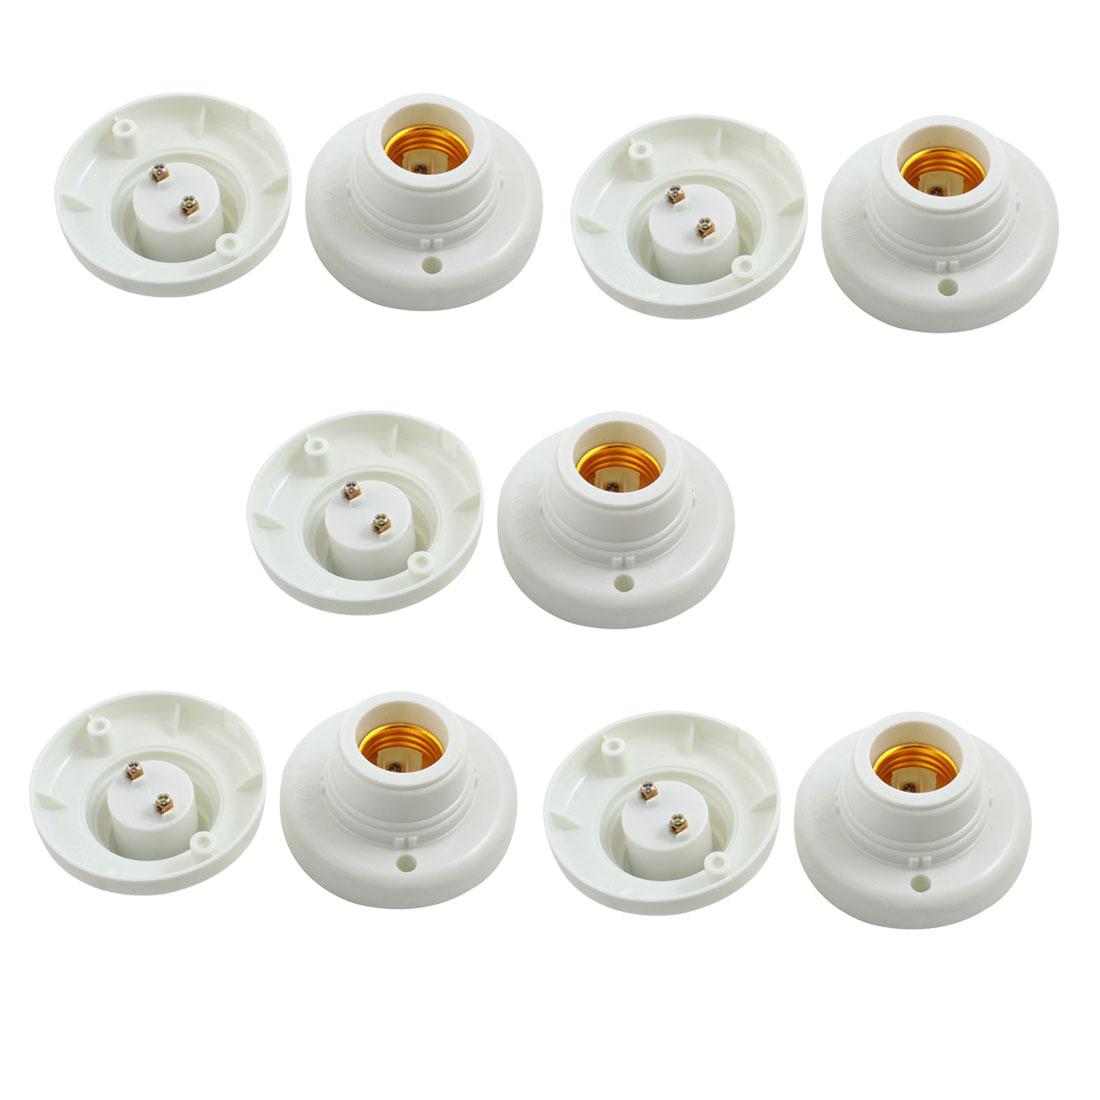 10PCS Wall Ceiling E27 Socket Lamp Bulb Holder Adapter Converter